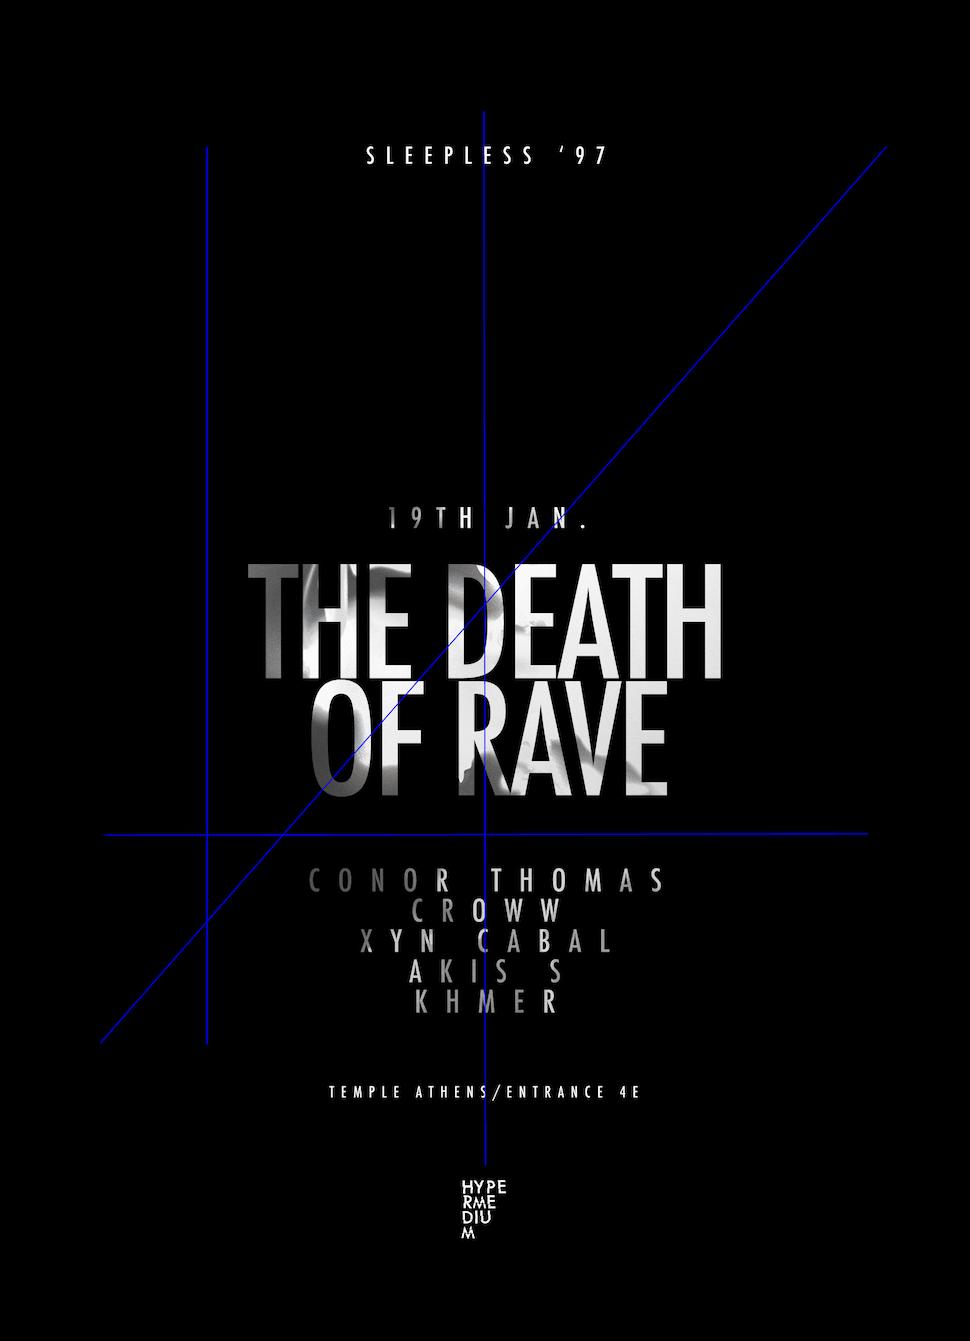 Death of Rave flyer